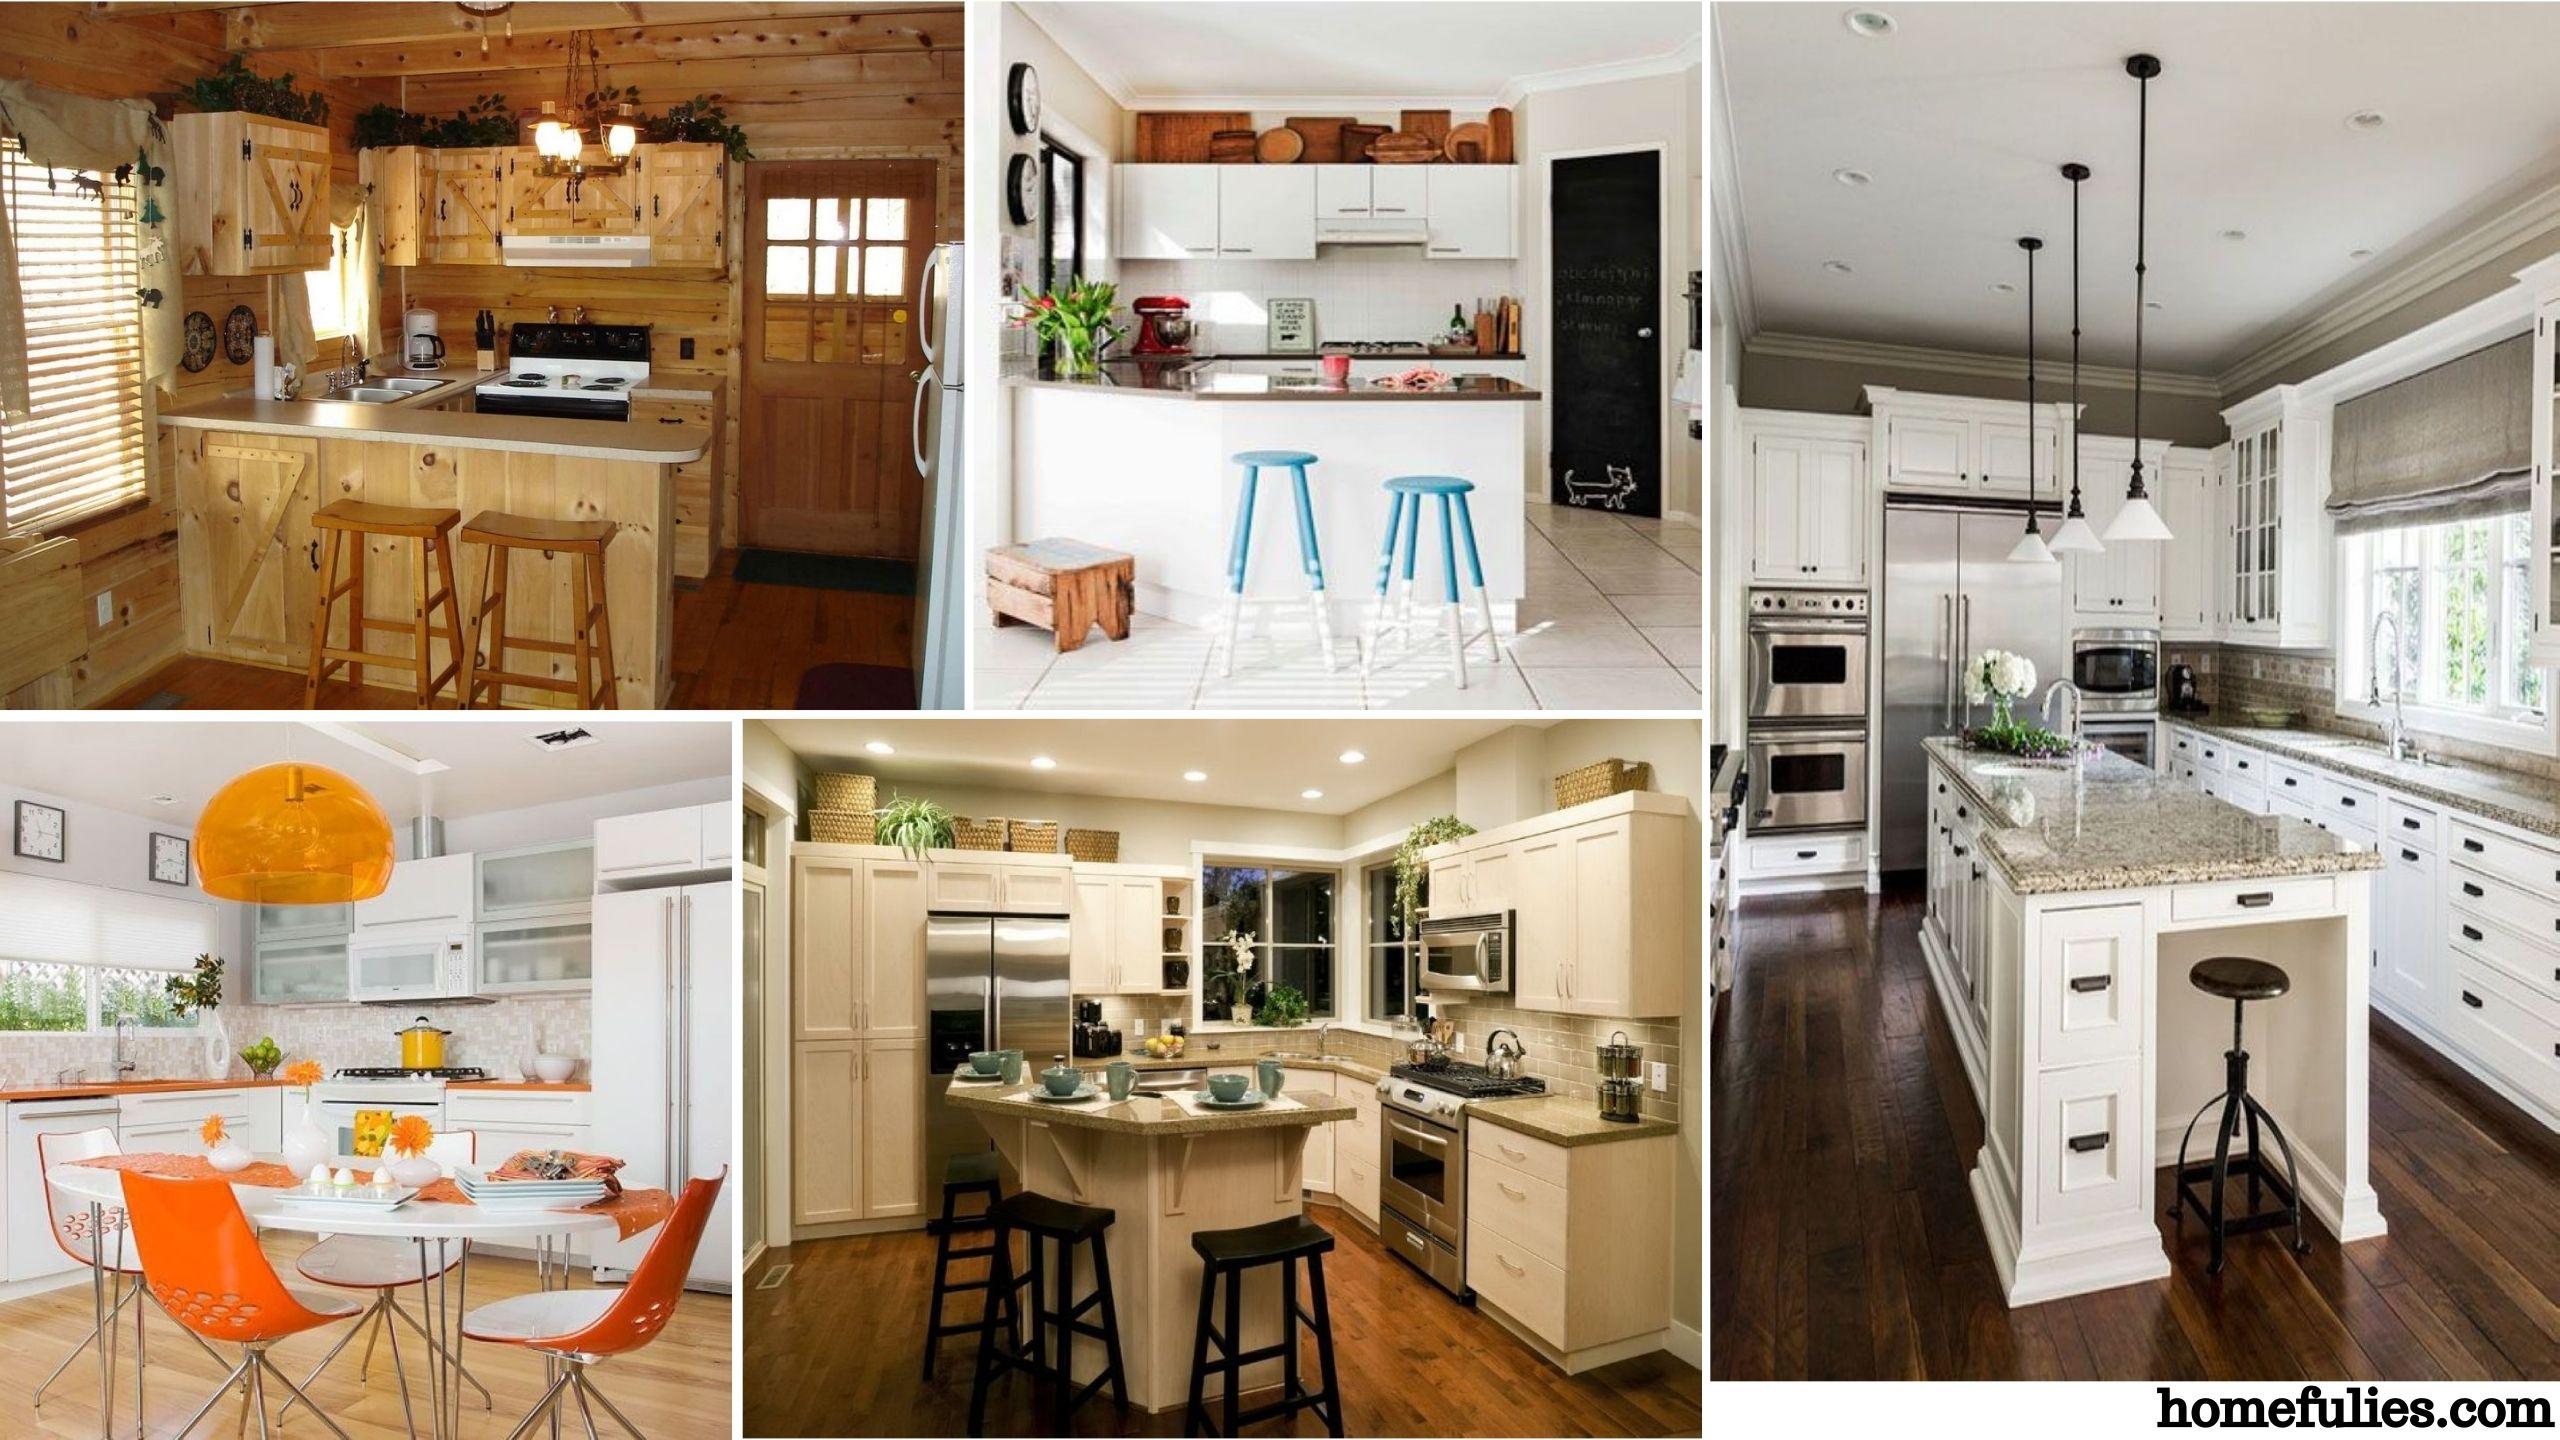 Amazing 36 Extraordinary Small Kitchen Design Ideas Httpshomefuliescomindex